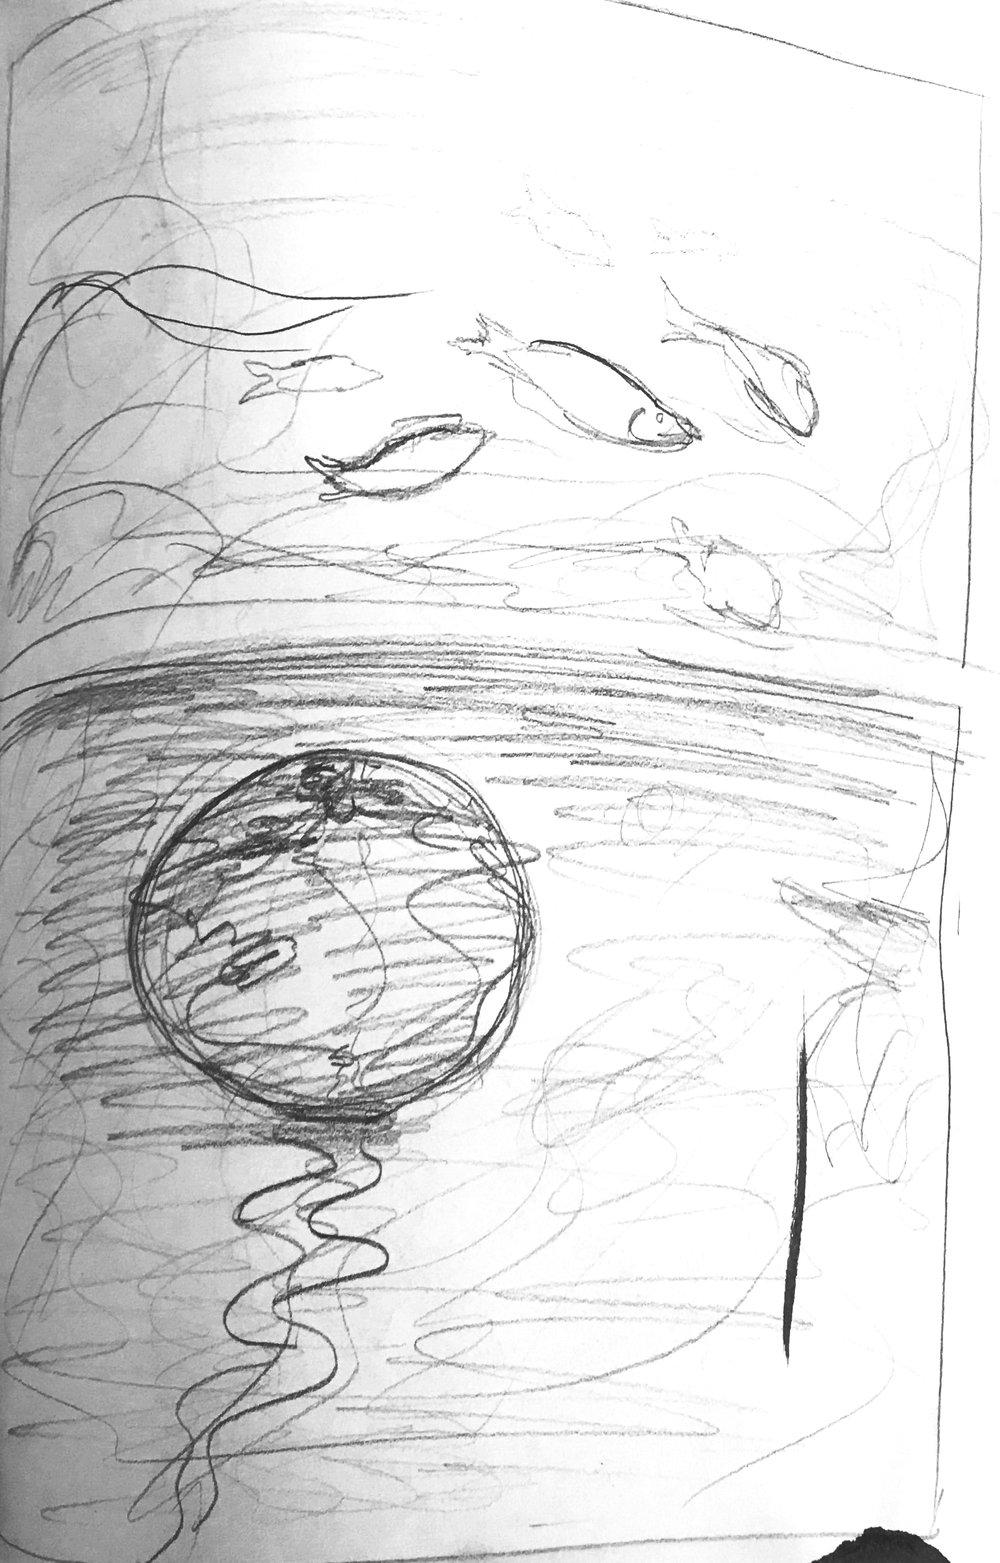 Sketch-Seascape-6.jpg